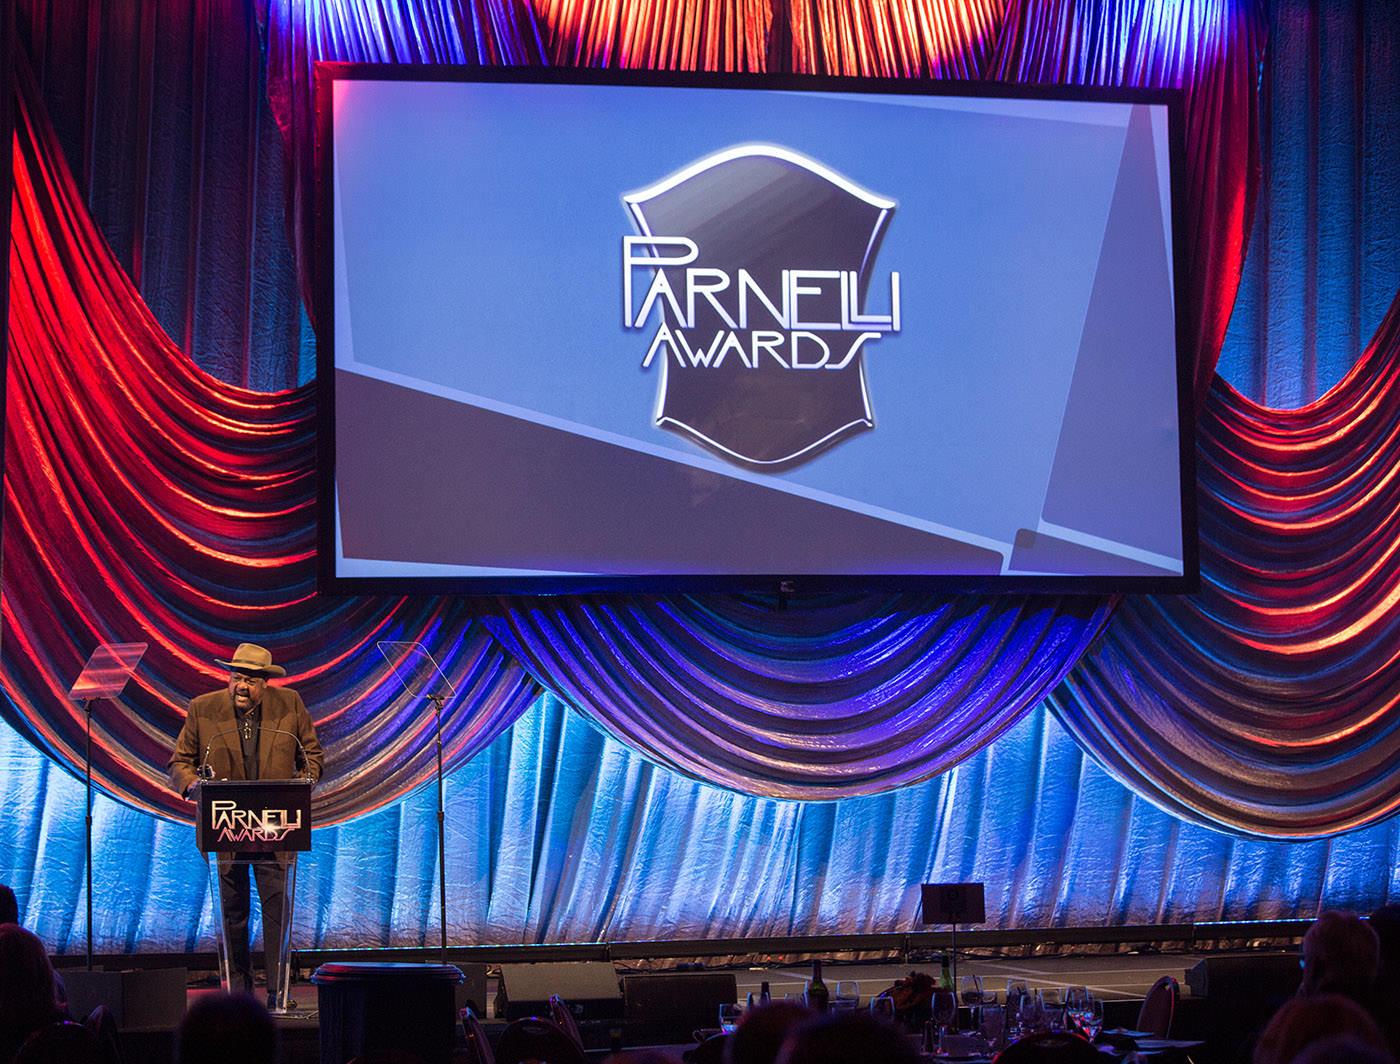 2014 PARNELLI AWARDS